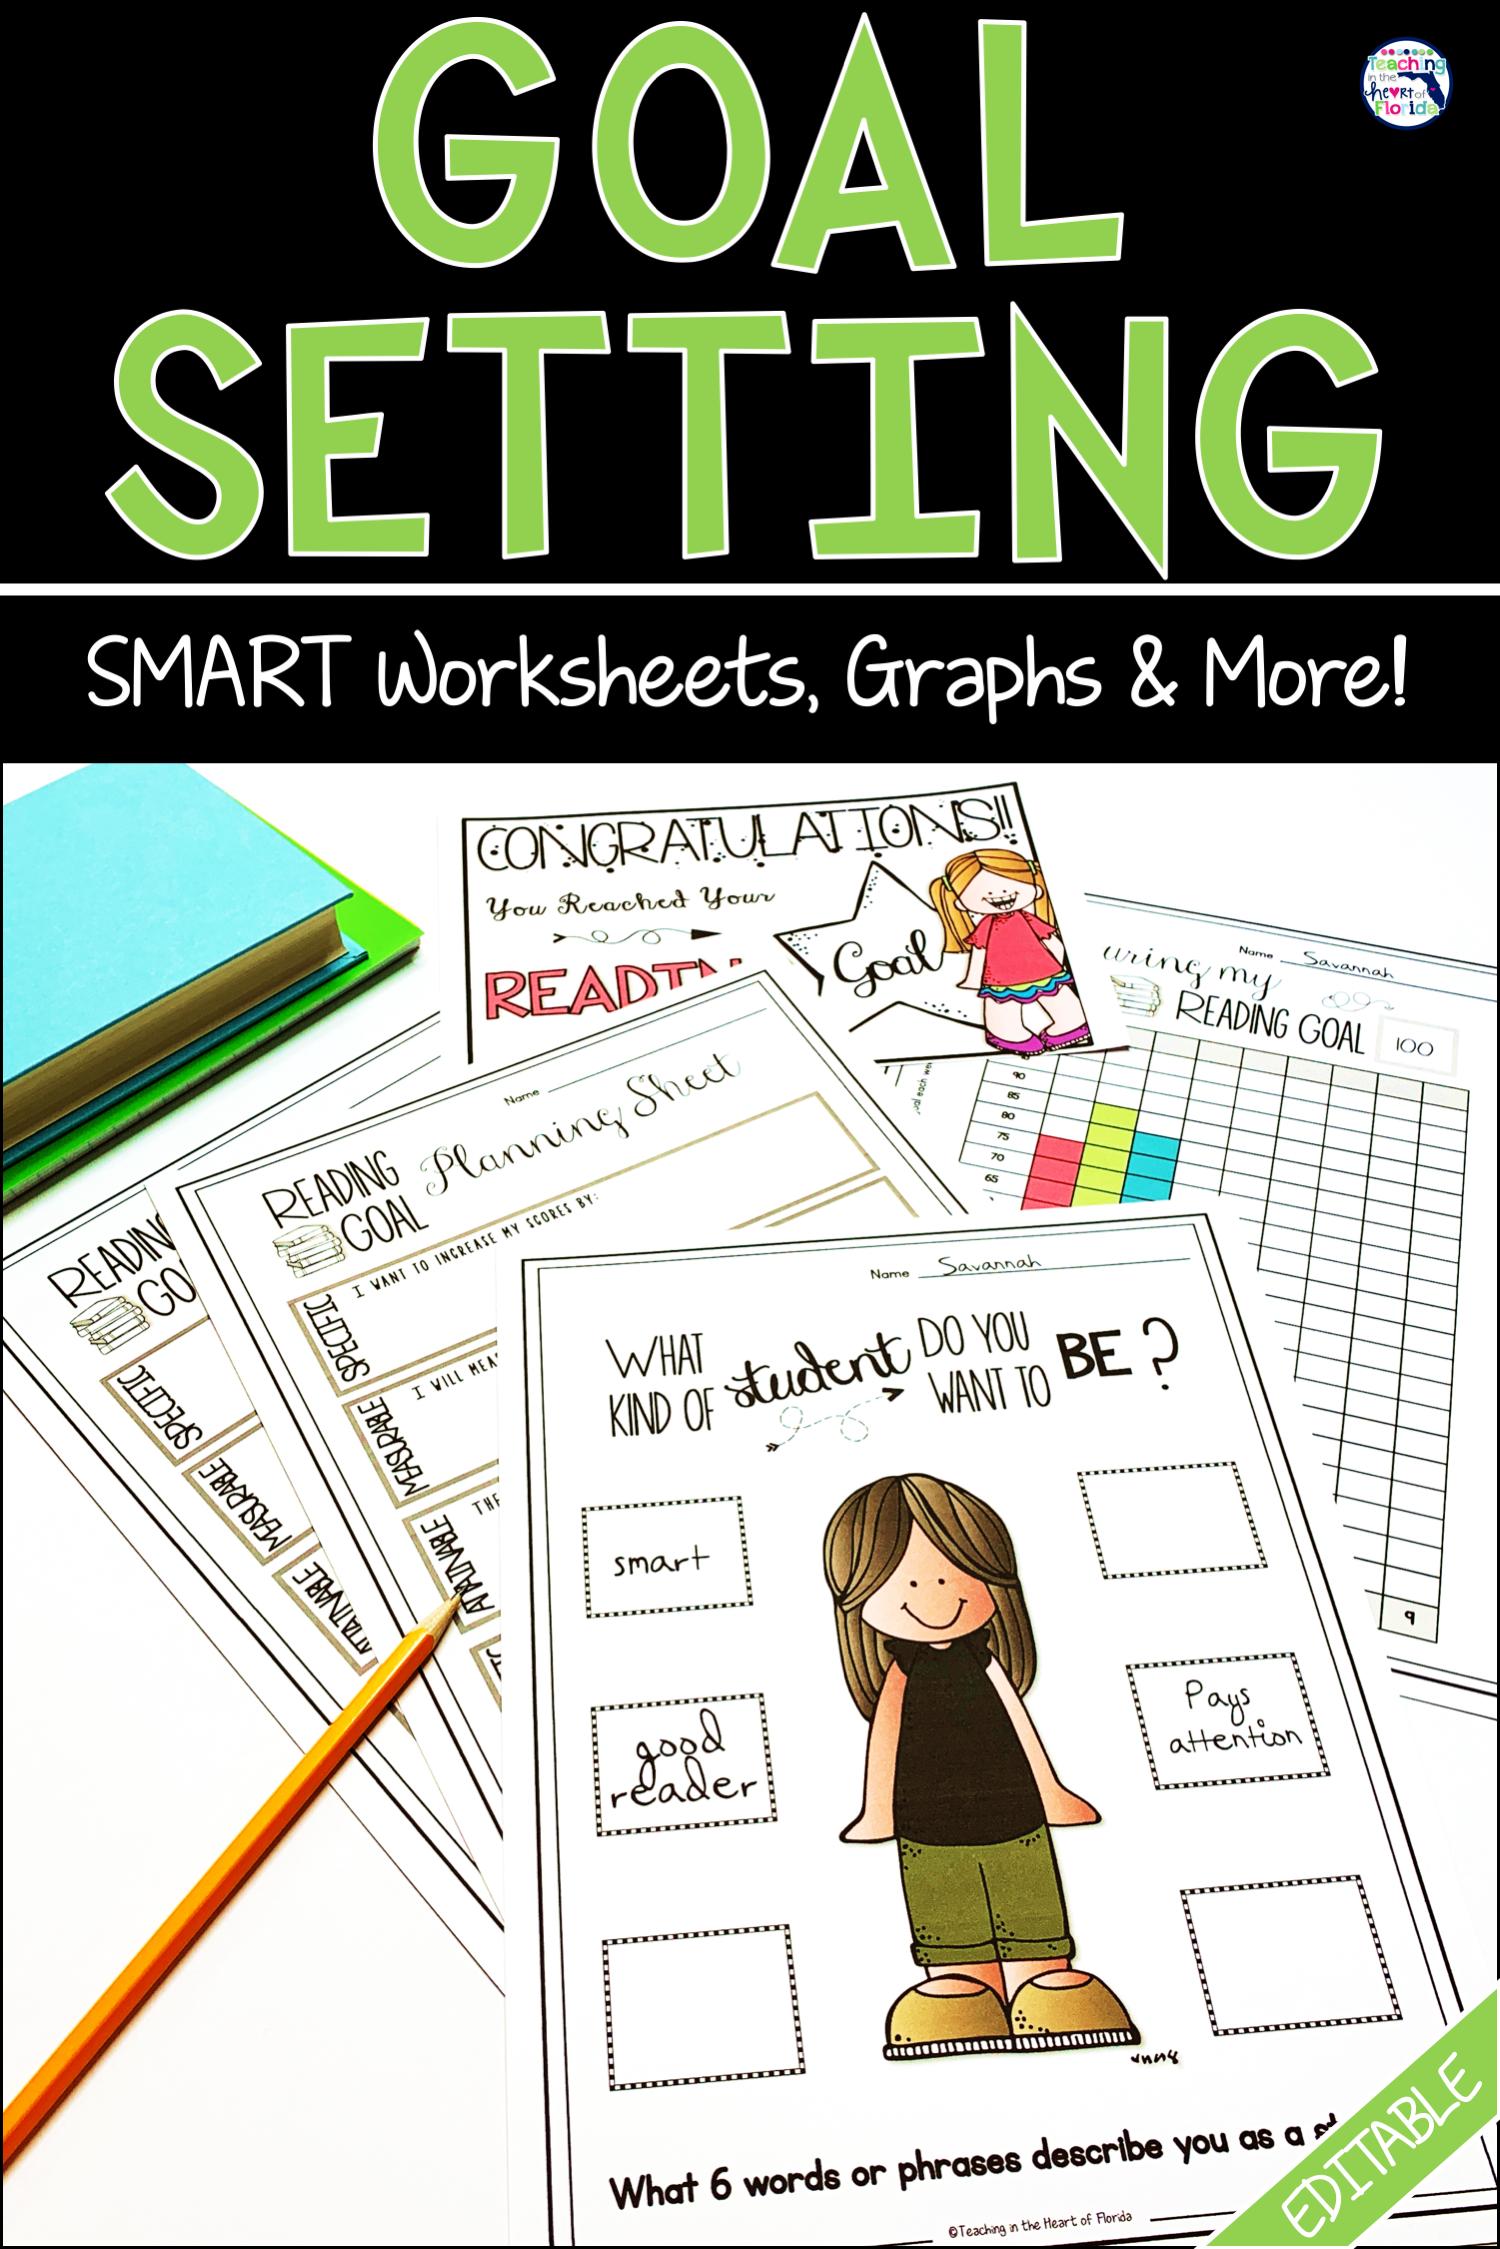 Goal Setting Data Tracking Smart Goals Worksheet Goals Worksheet Social Emotional Learning [ 2249 x 1500 Pixel ]